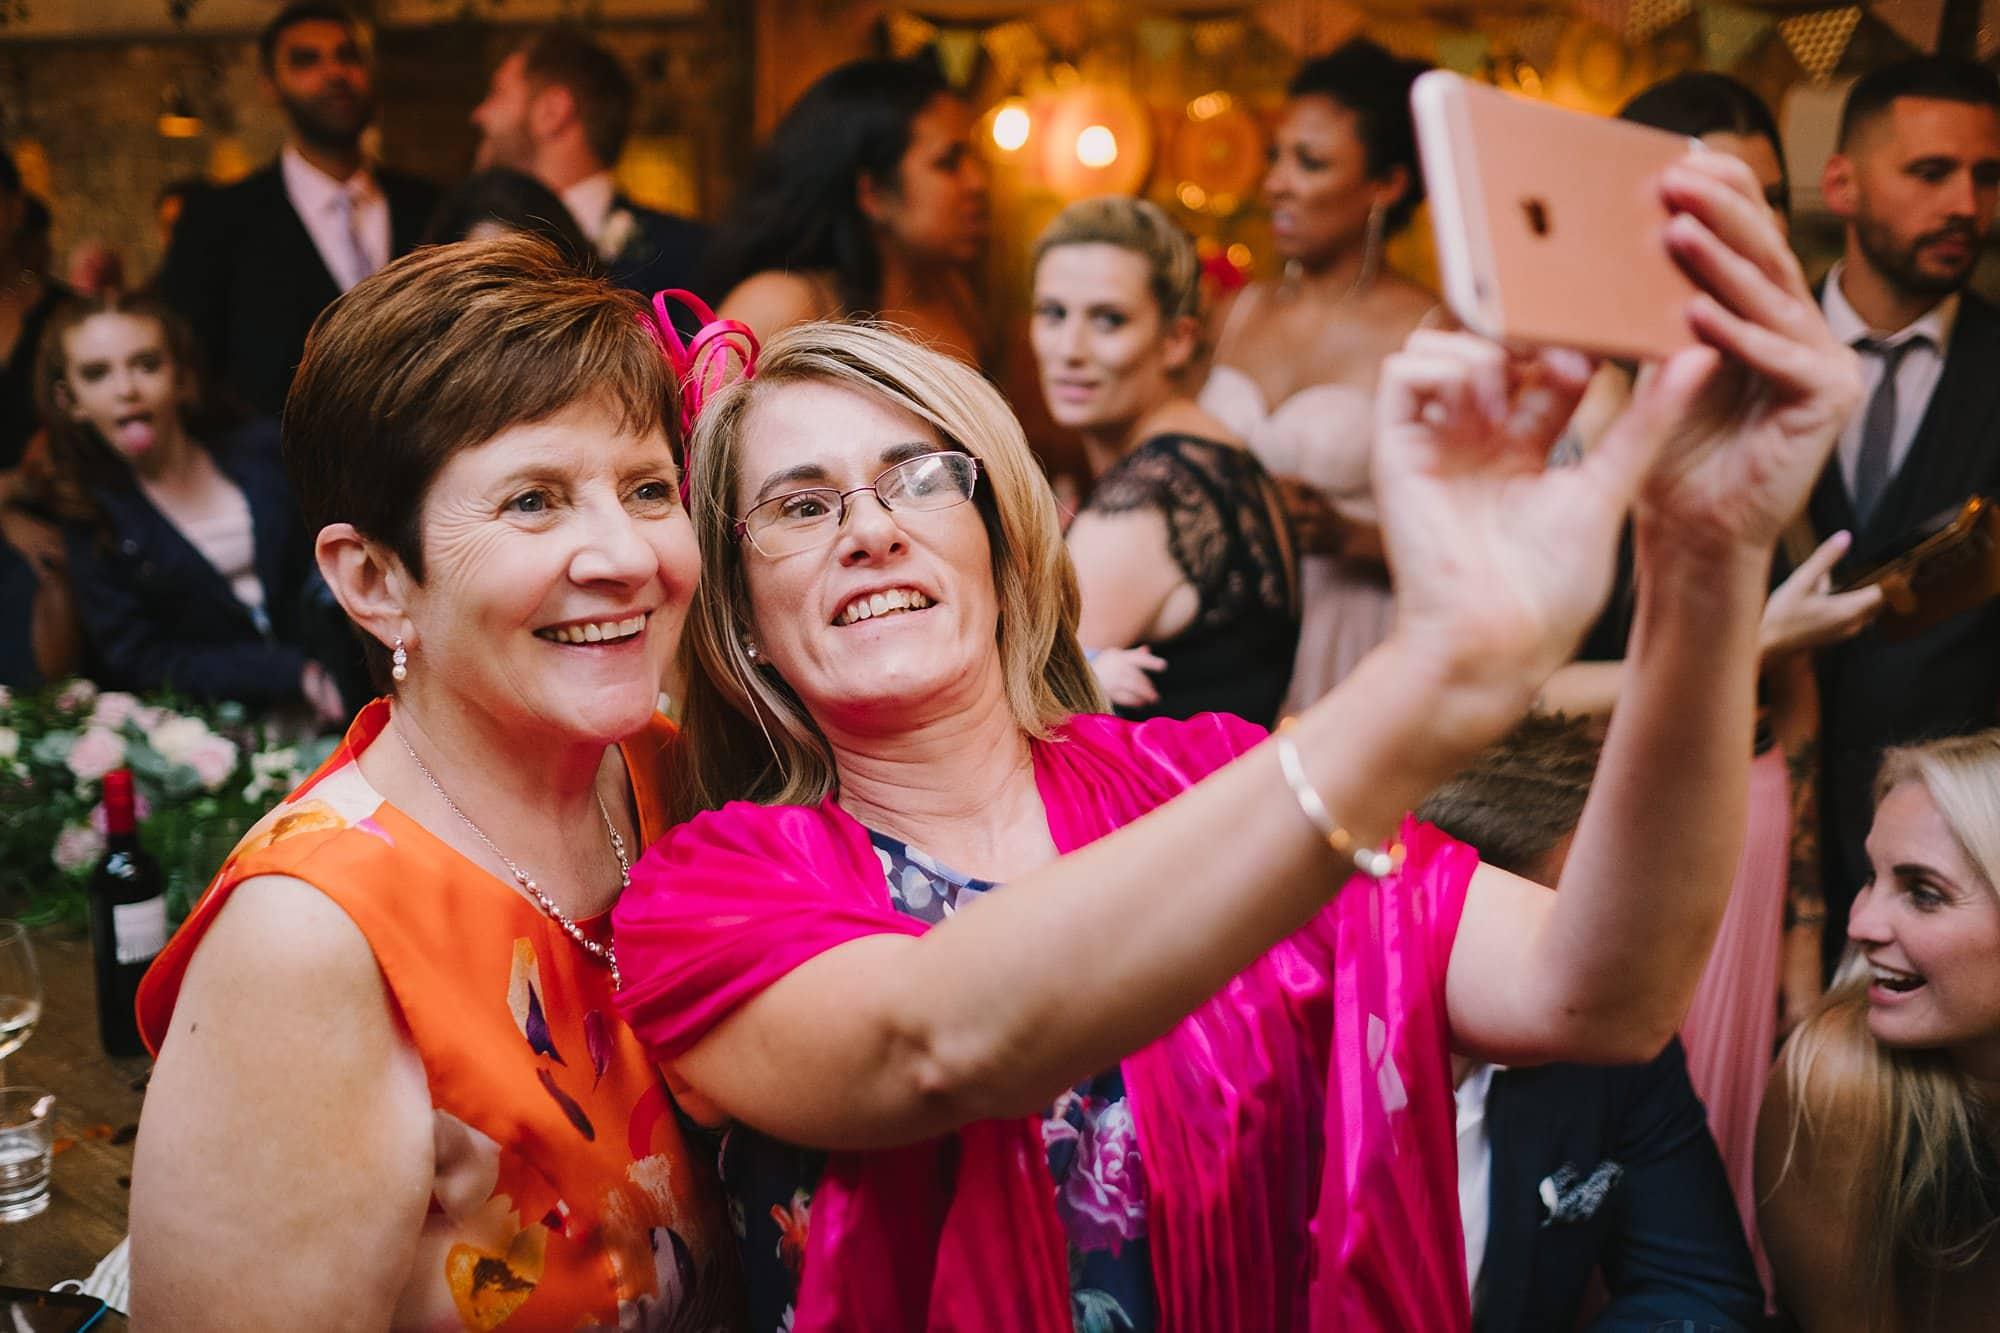 london pub wedding photographer jn 059 - The County Arms Wedding Photographer   Jen & Nick